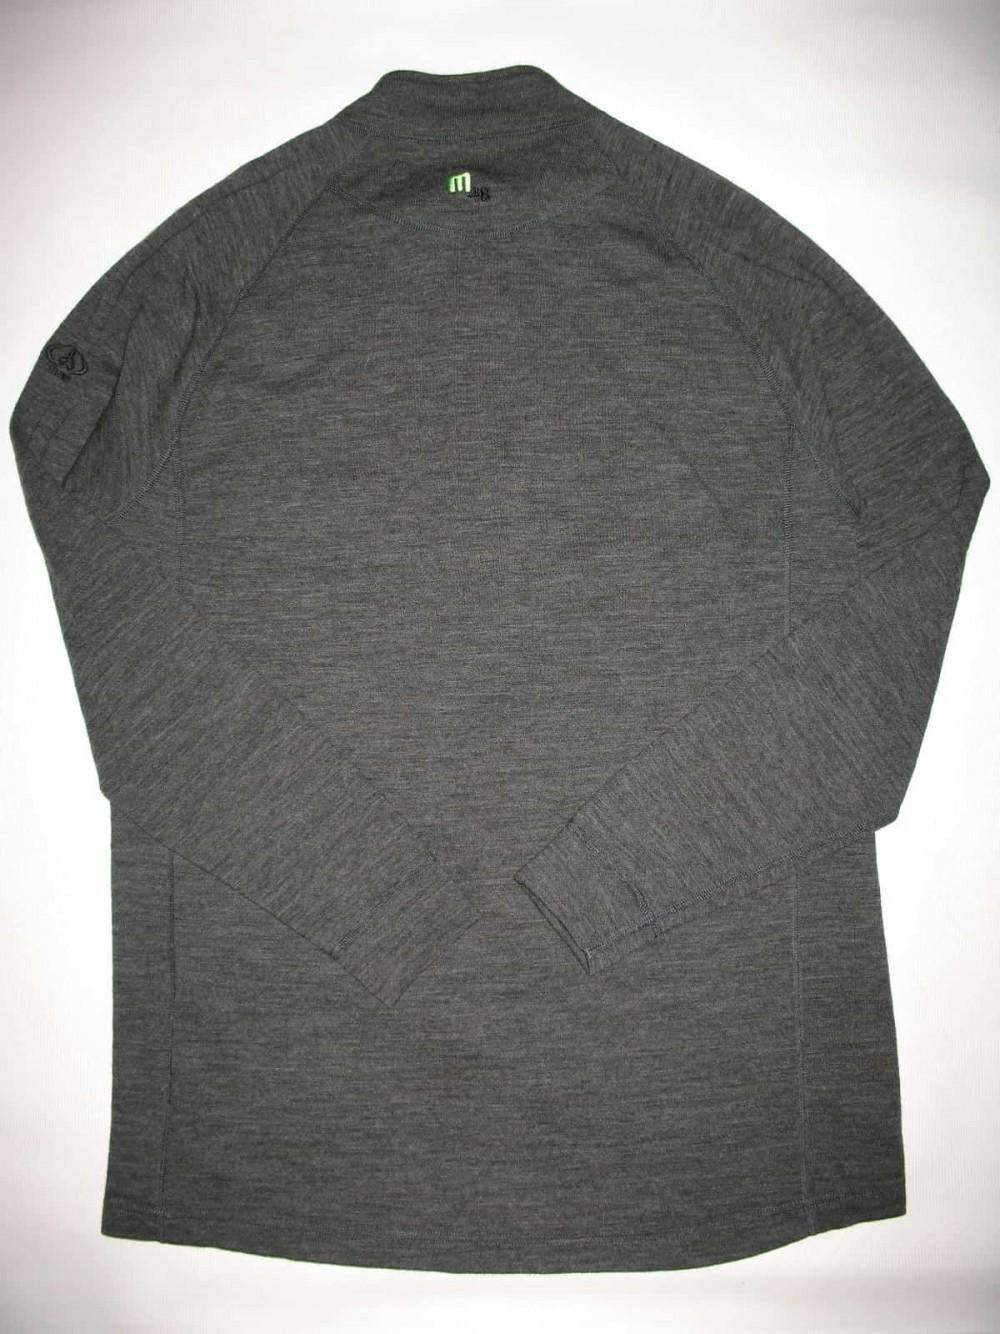 Термобелье MAUL merino jersey (размер 58-XXL) - 1